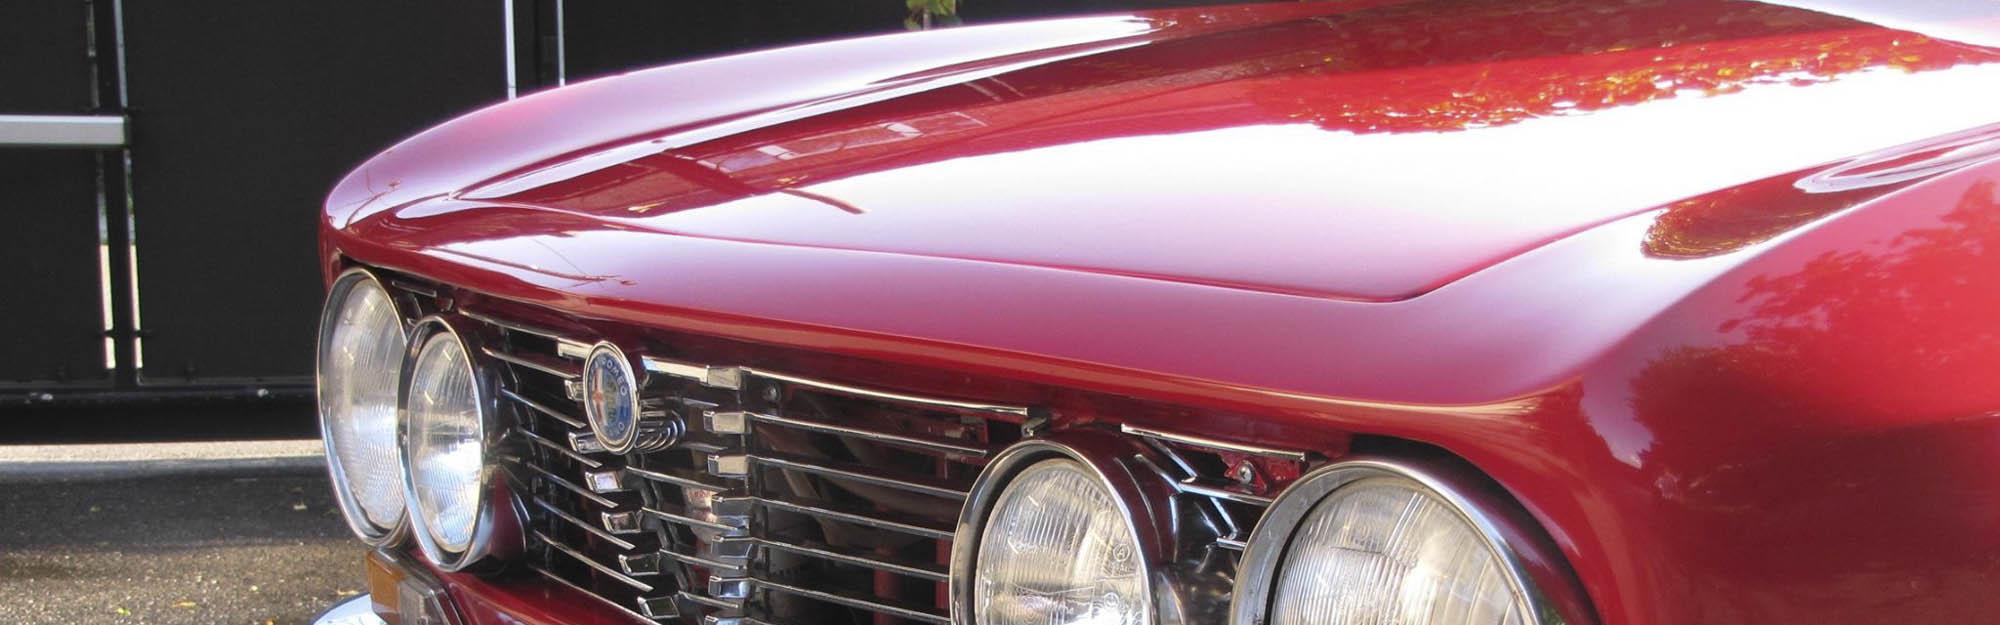 Car-wash-detailing-charleroi-automorphose-5